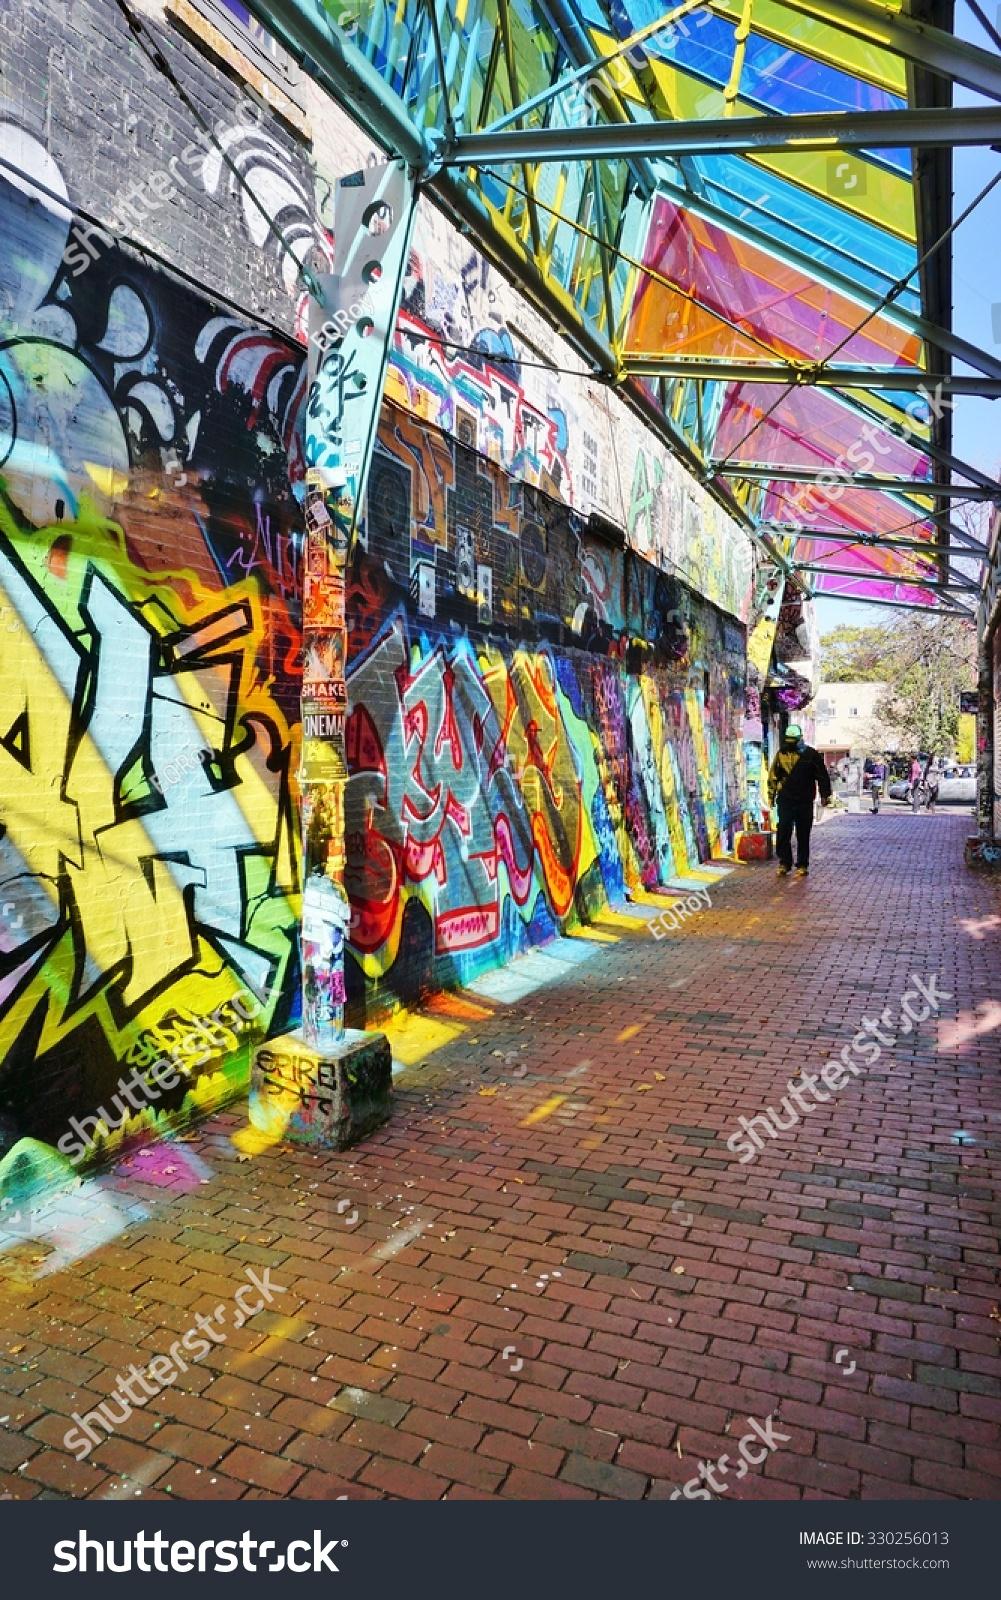 Graffiti wall cambridge ma - Cambridge Ma 16 October 2015 Colorful Graffiti And Mural Street Art In The